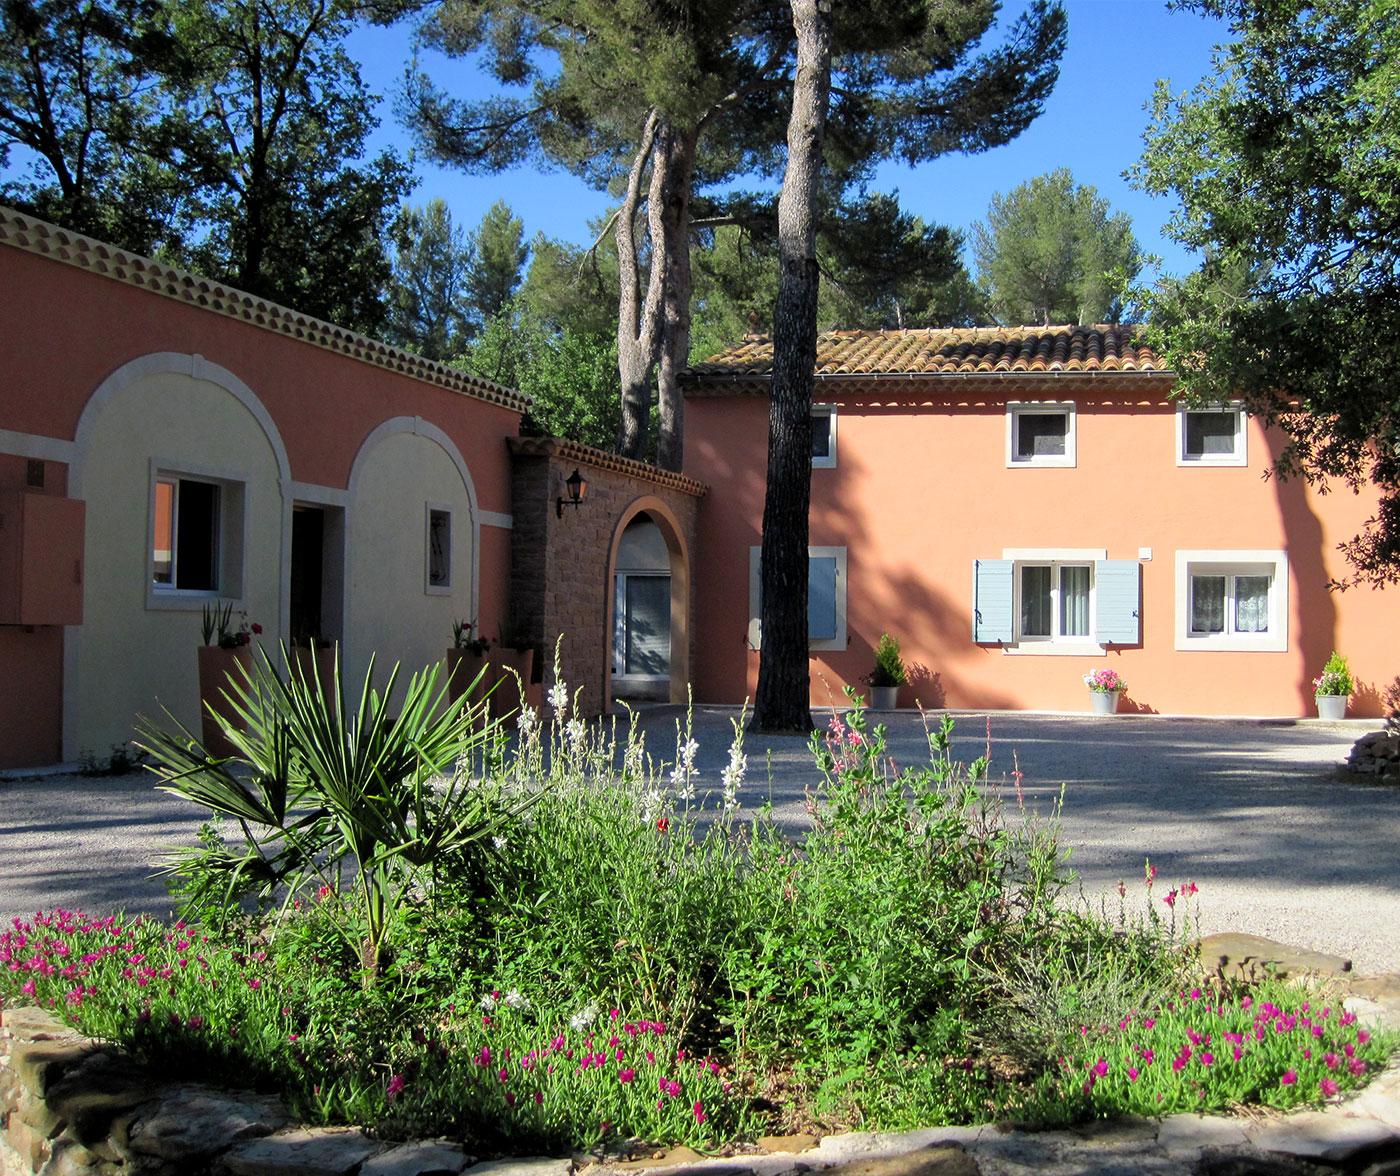 Camping familial 3 étoiles près d'Aix-en-Provence